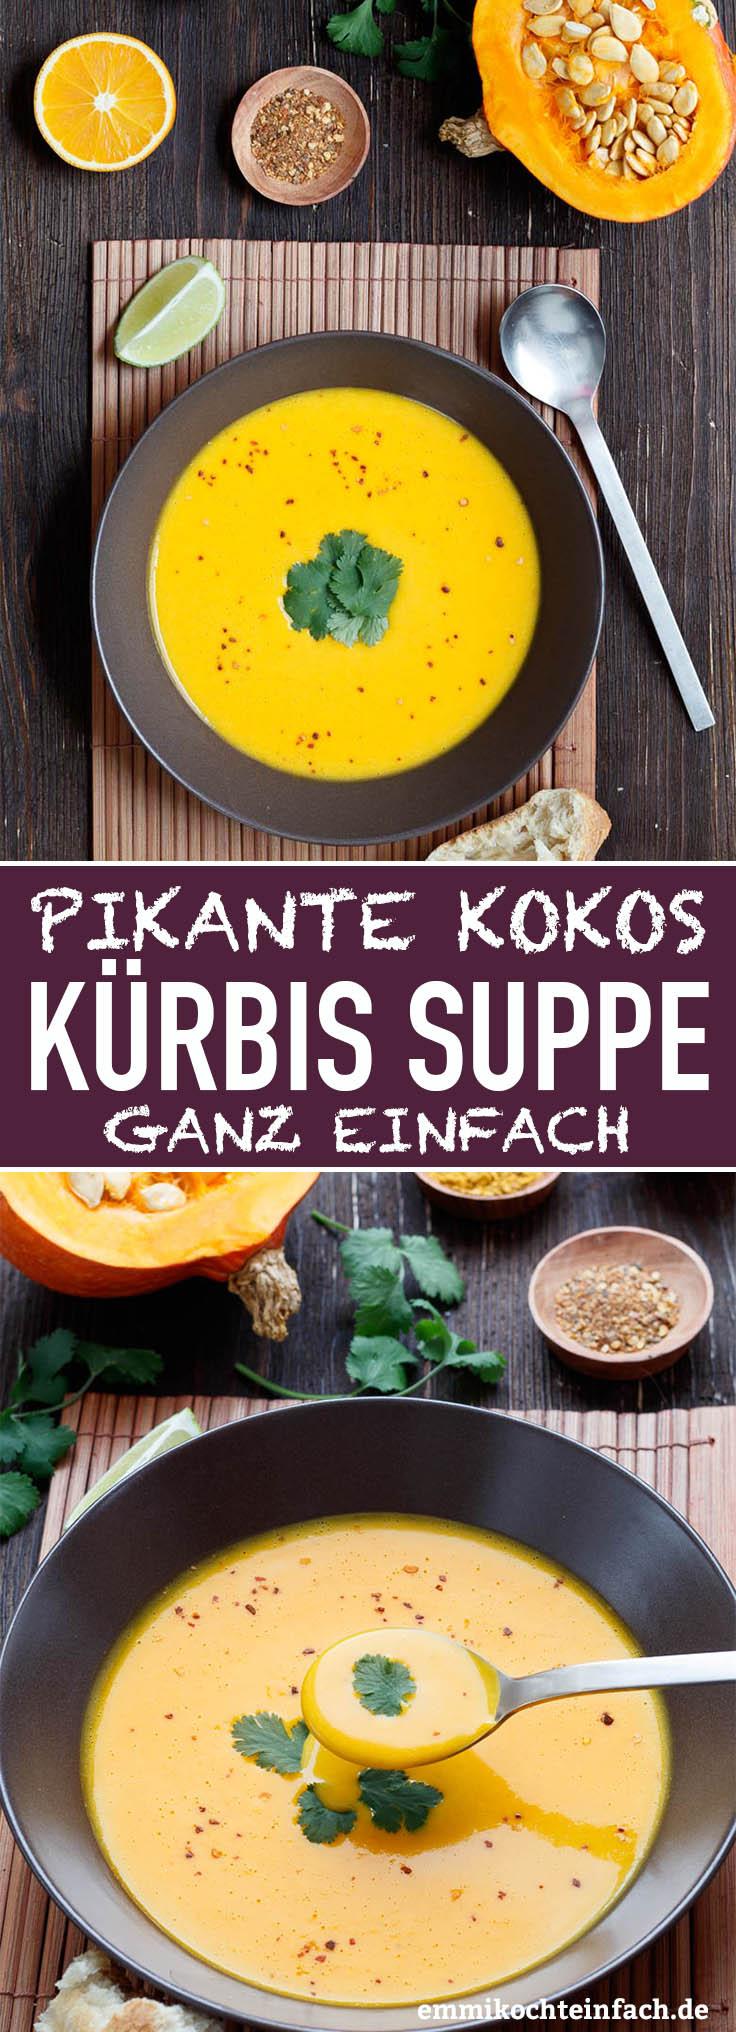 Pikante Kürbis Kokos Suppe - www.emmikochteinfach.de